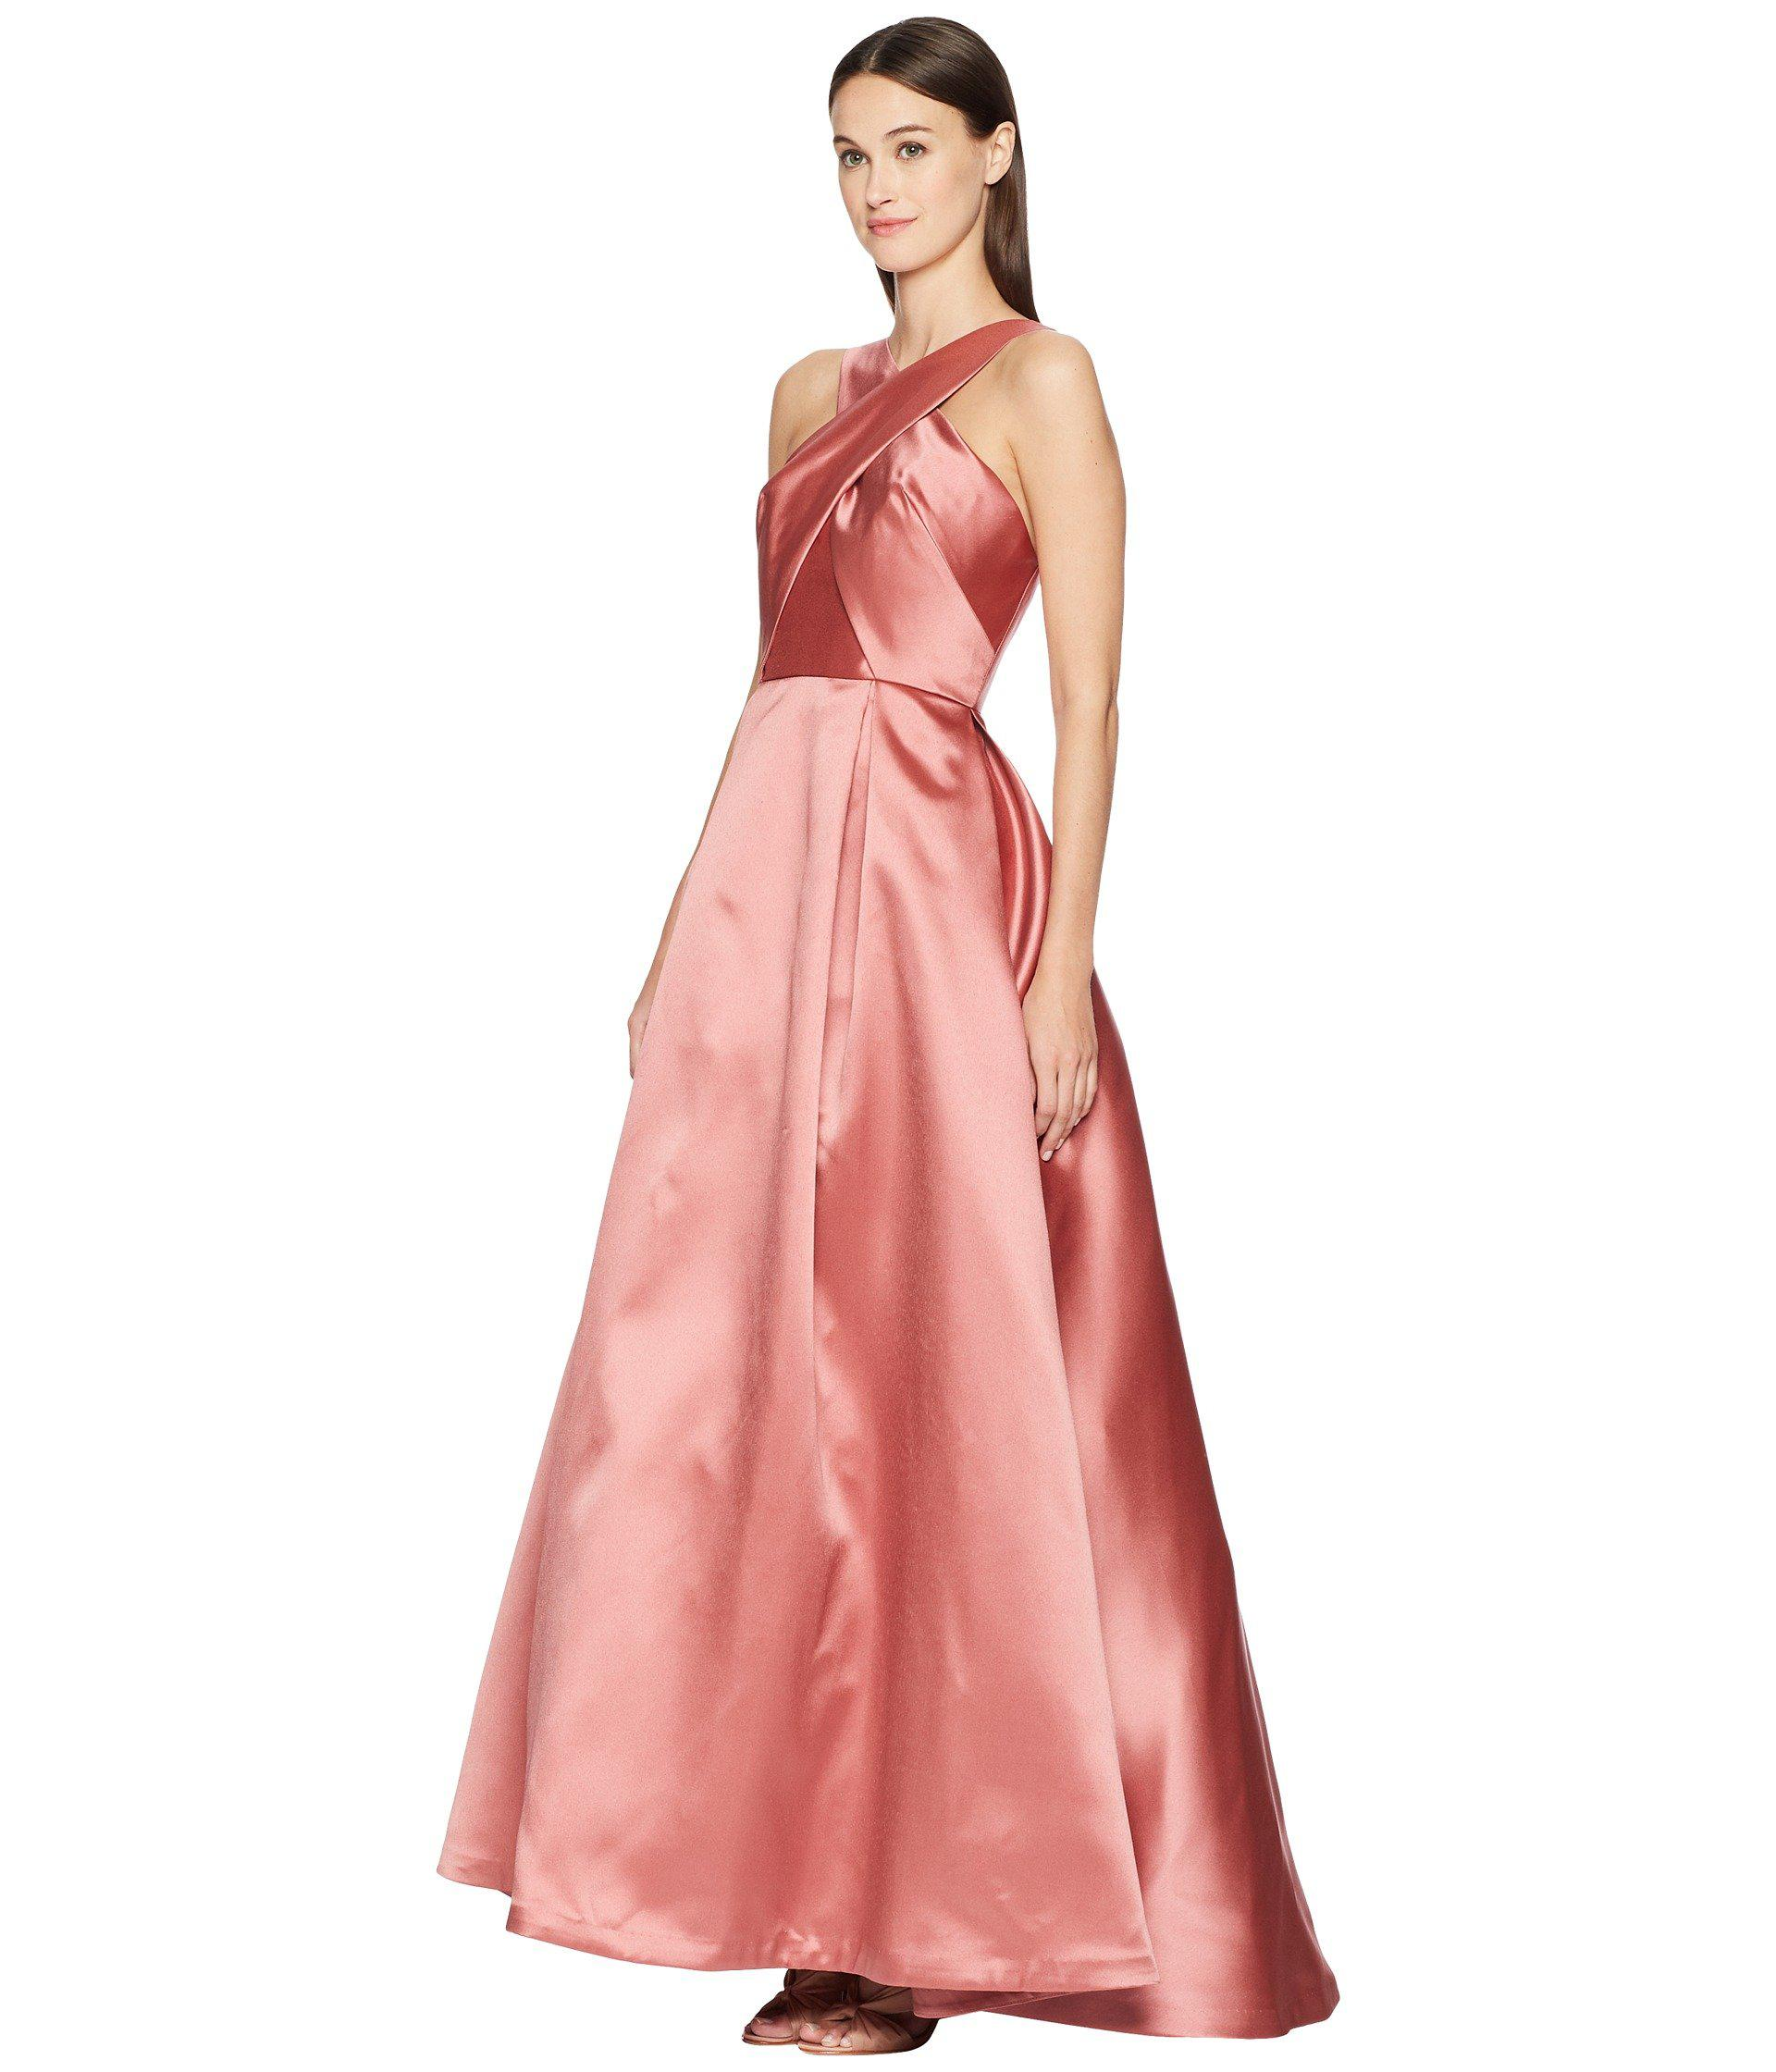 Lyst Ml Monique Lhuillier Cross Front Satin Gown Blush Pink Women S Dress In Save 55 10791366906475